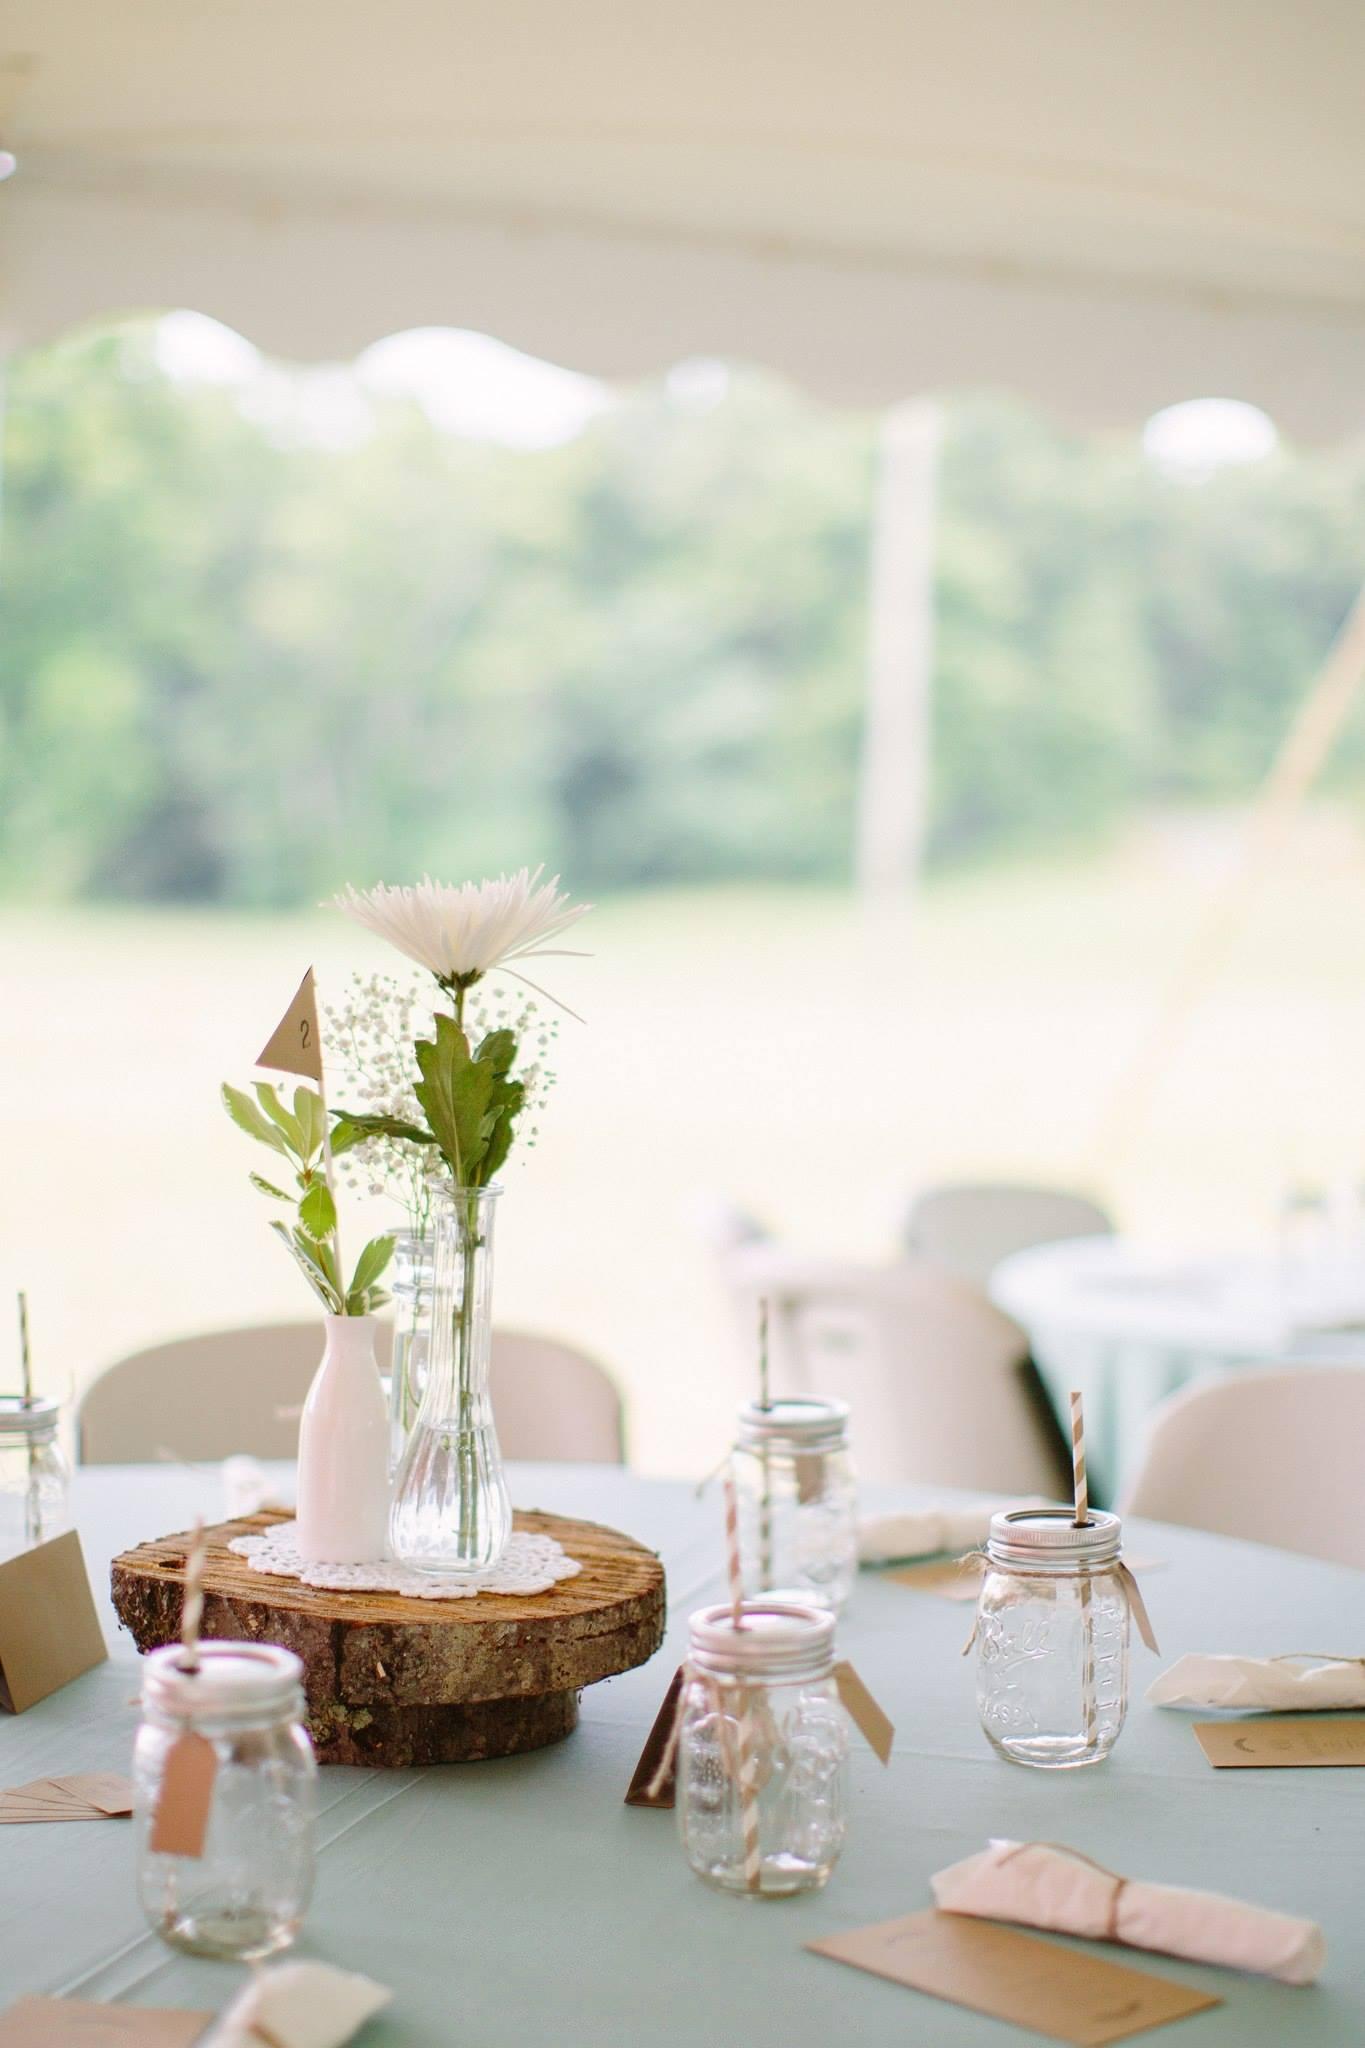 Daytona May Photography Charlottesville, VA wedding